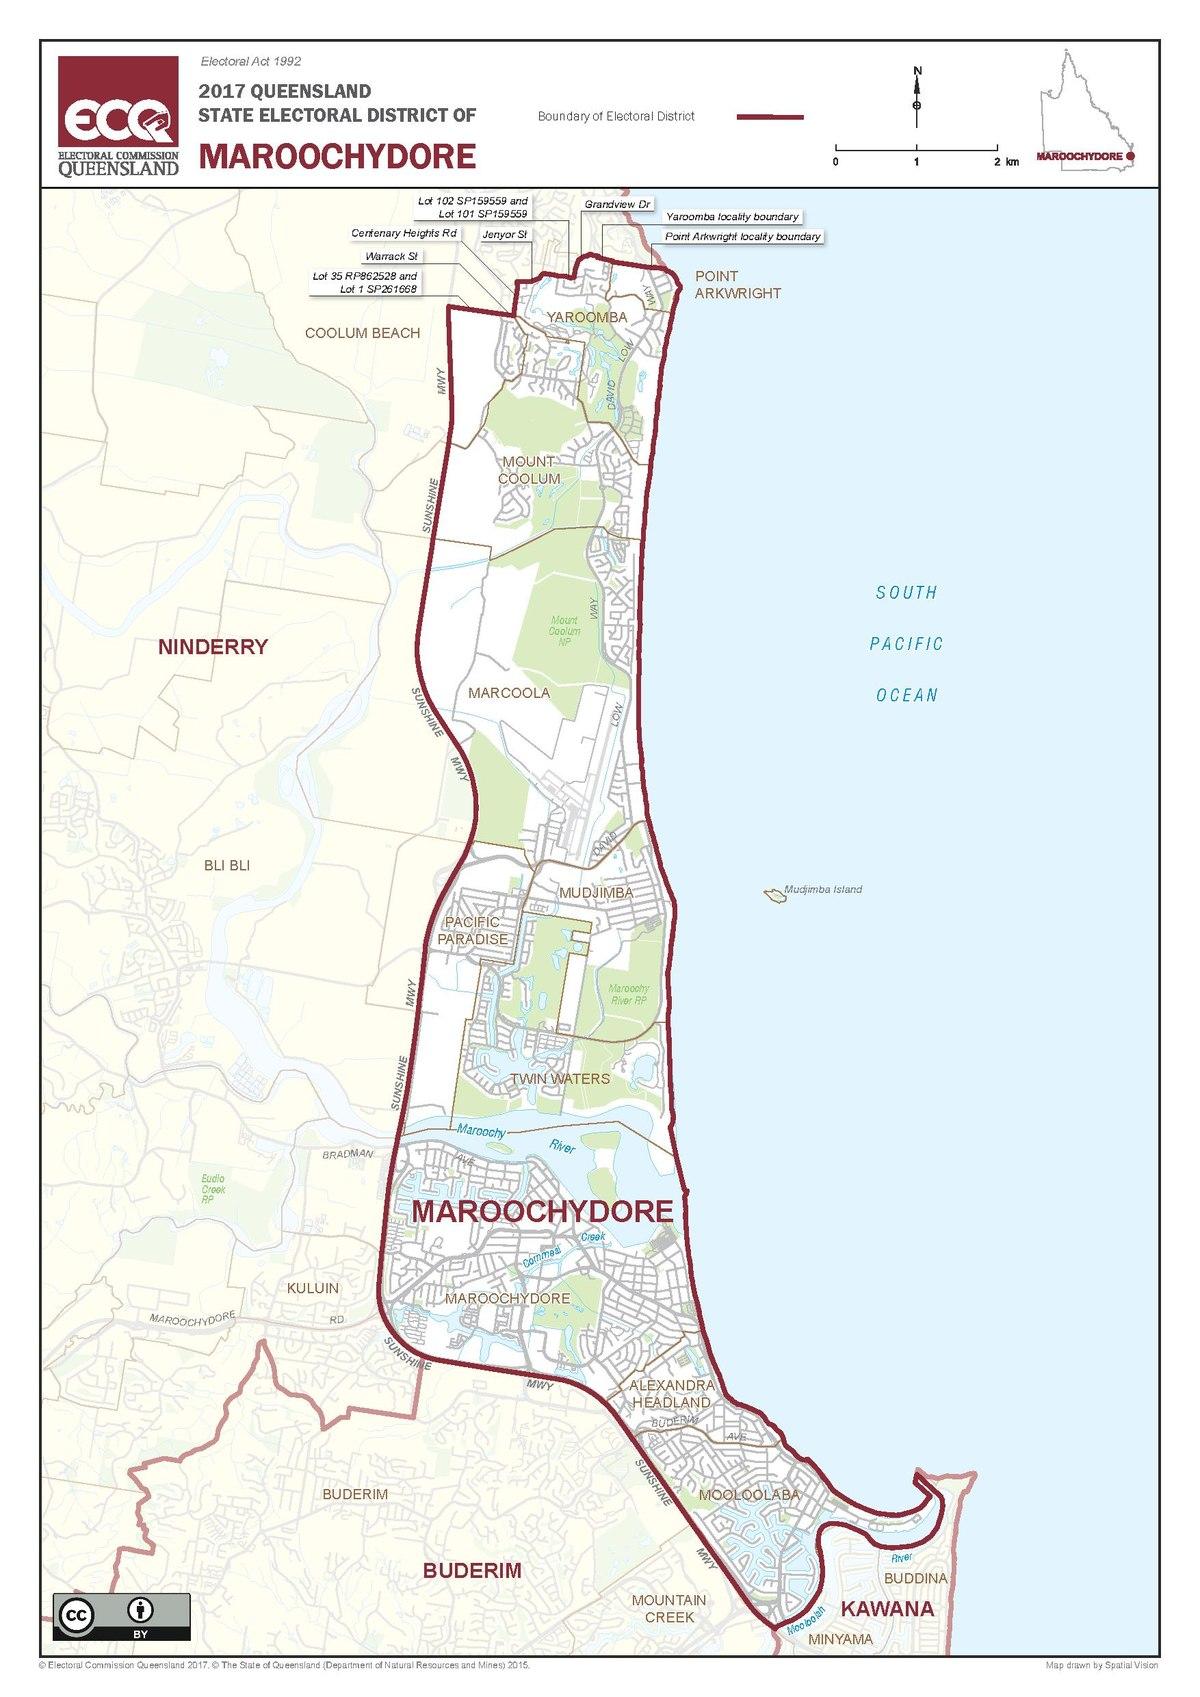 Electoral district of Maroochydore Wikipedia